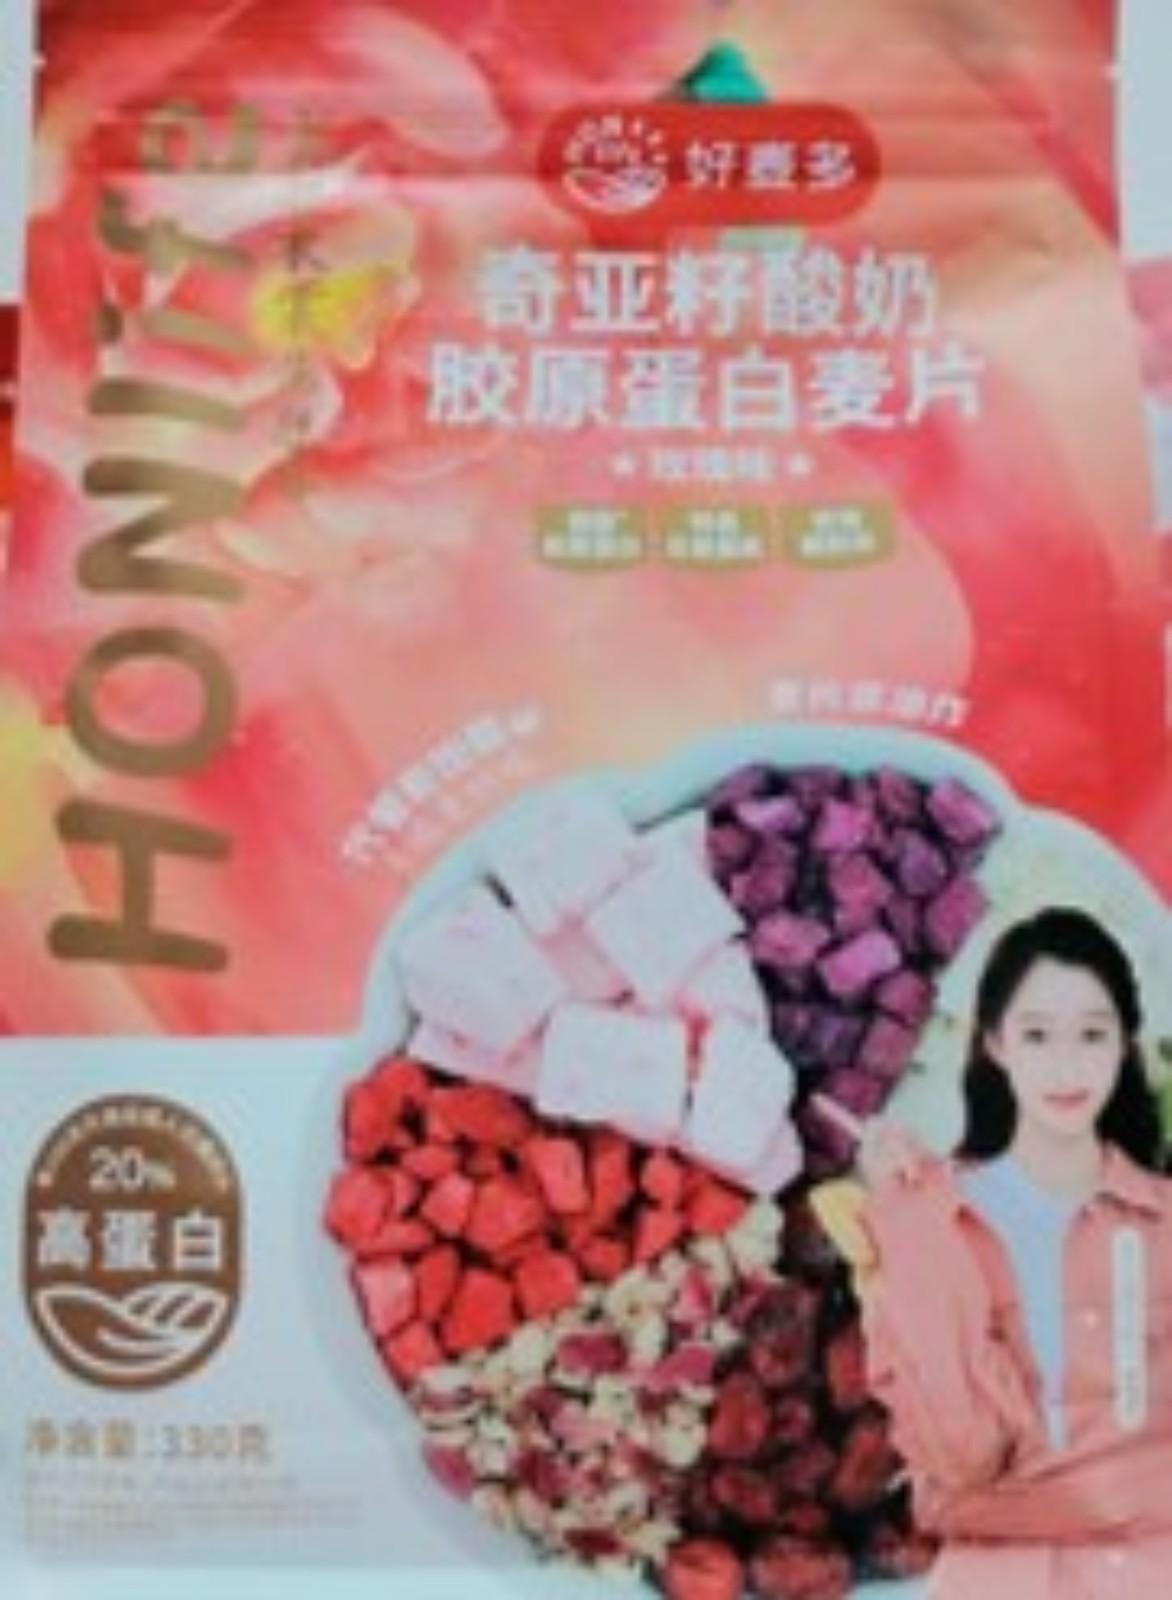 HON LIFE CHIA SEED CEREAL YOGURT(ROSE)GRANOLA 330G 奇籽酸奶 胶原蛋白麦片(玫瑰味)